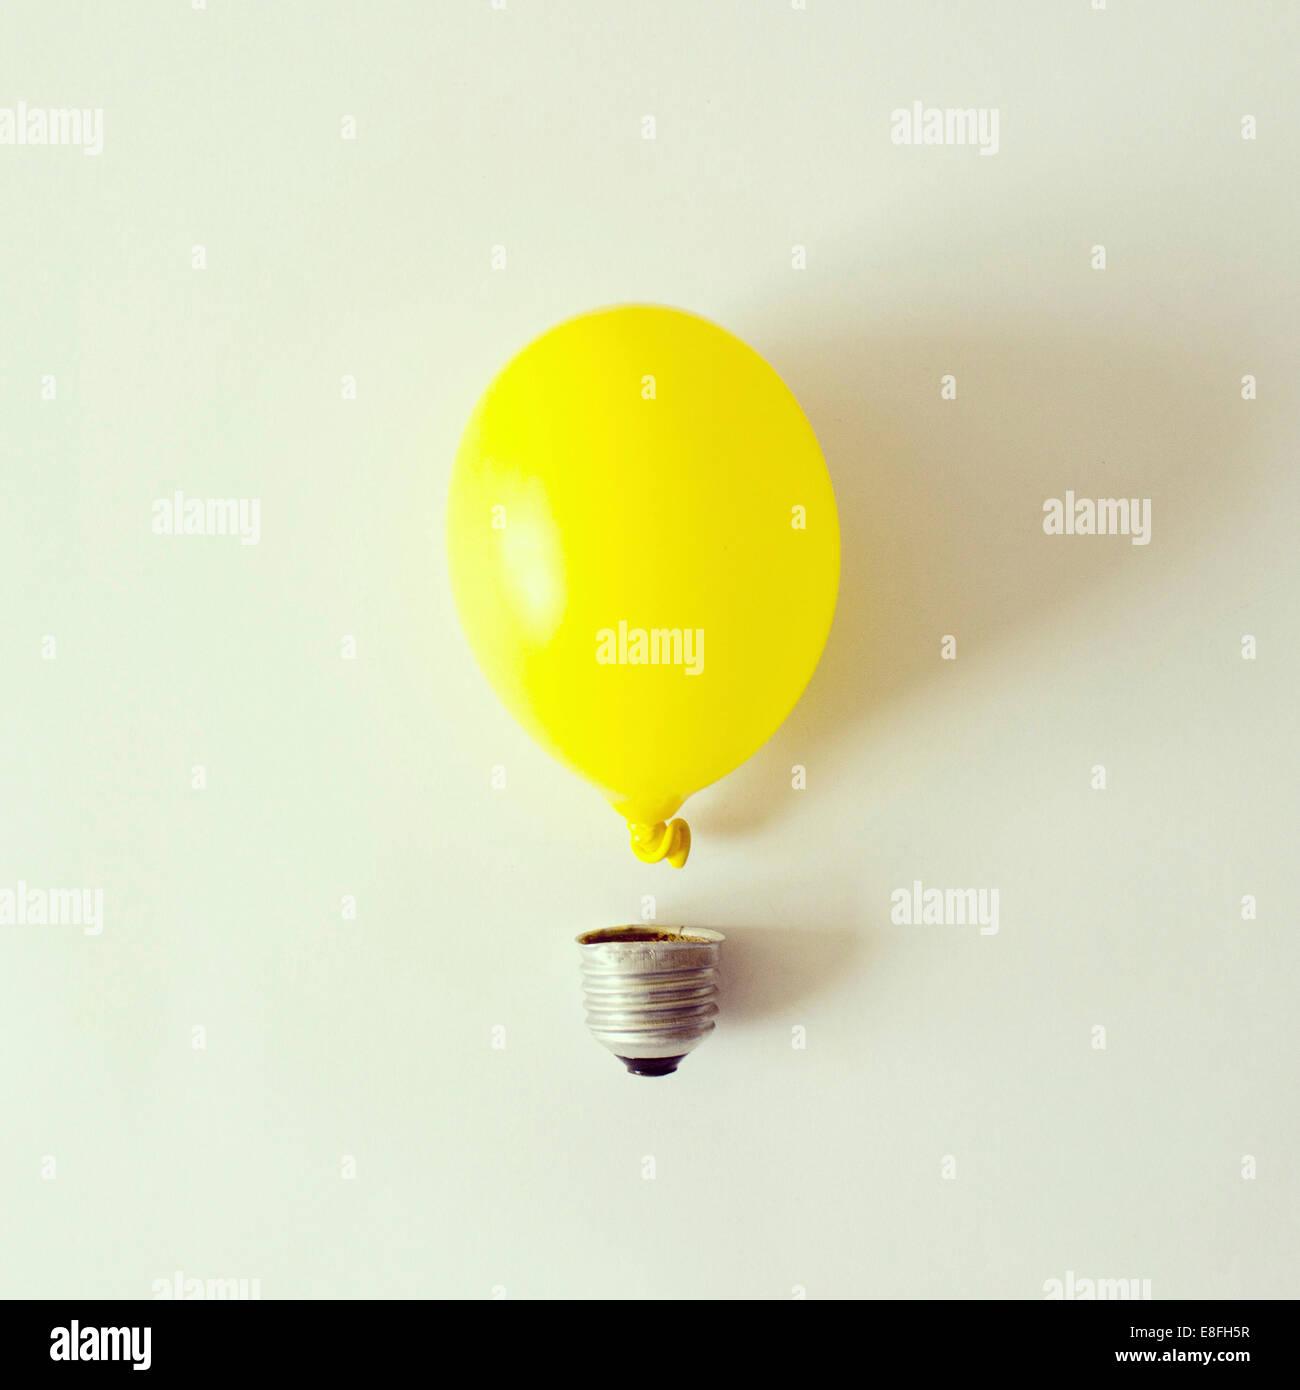 Foto de estudio conceptual de la bombilla Imagen De Stock